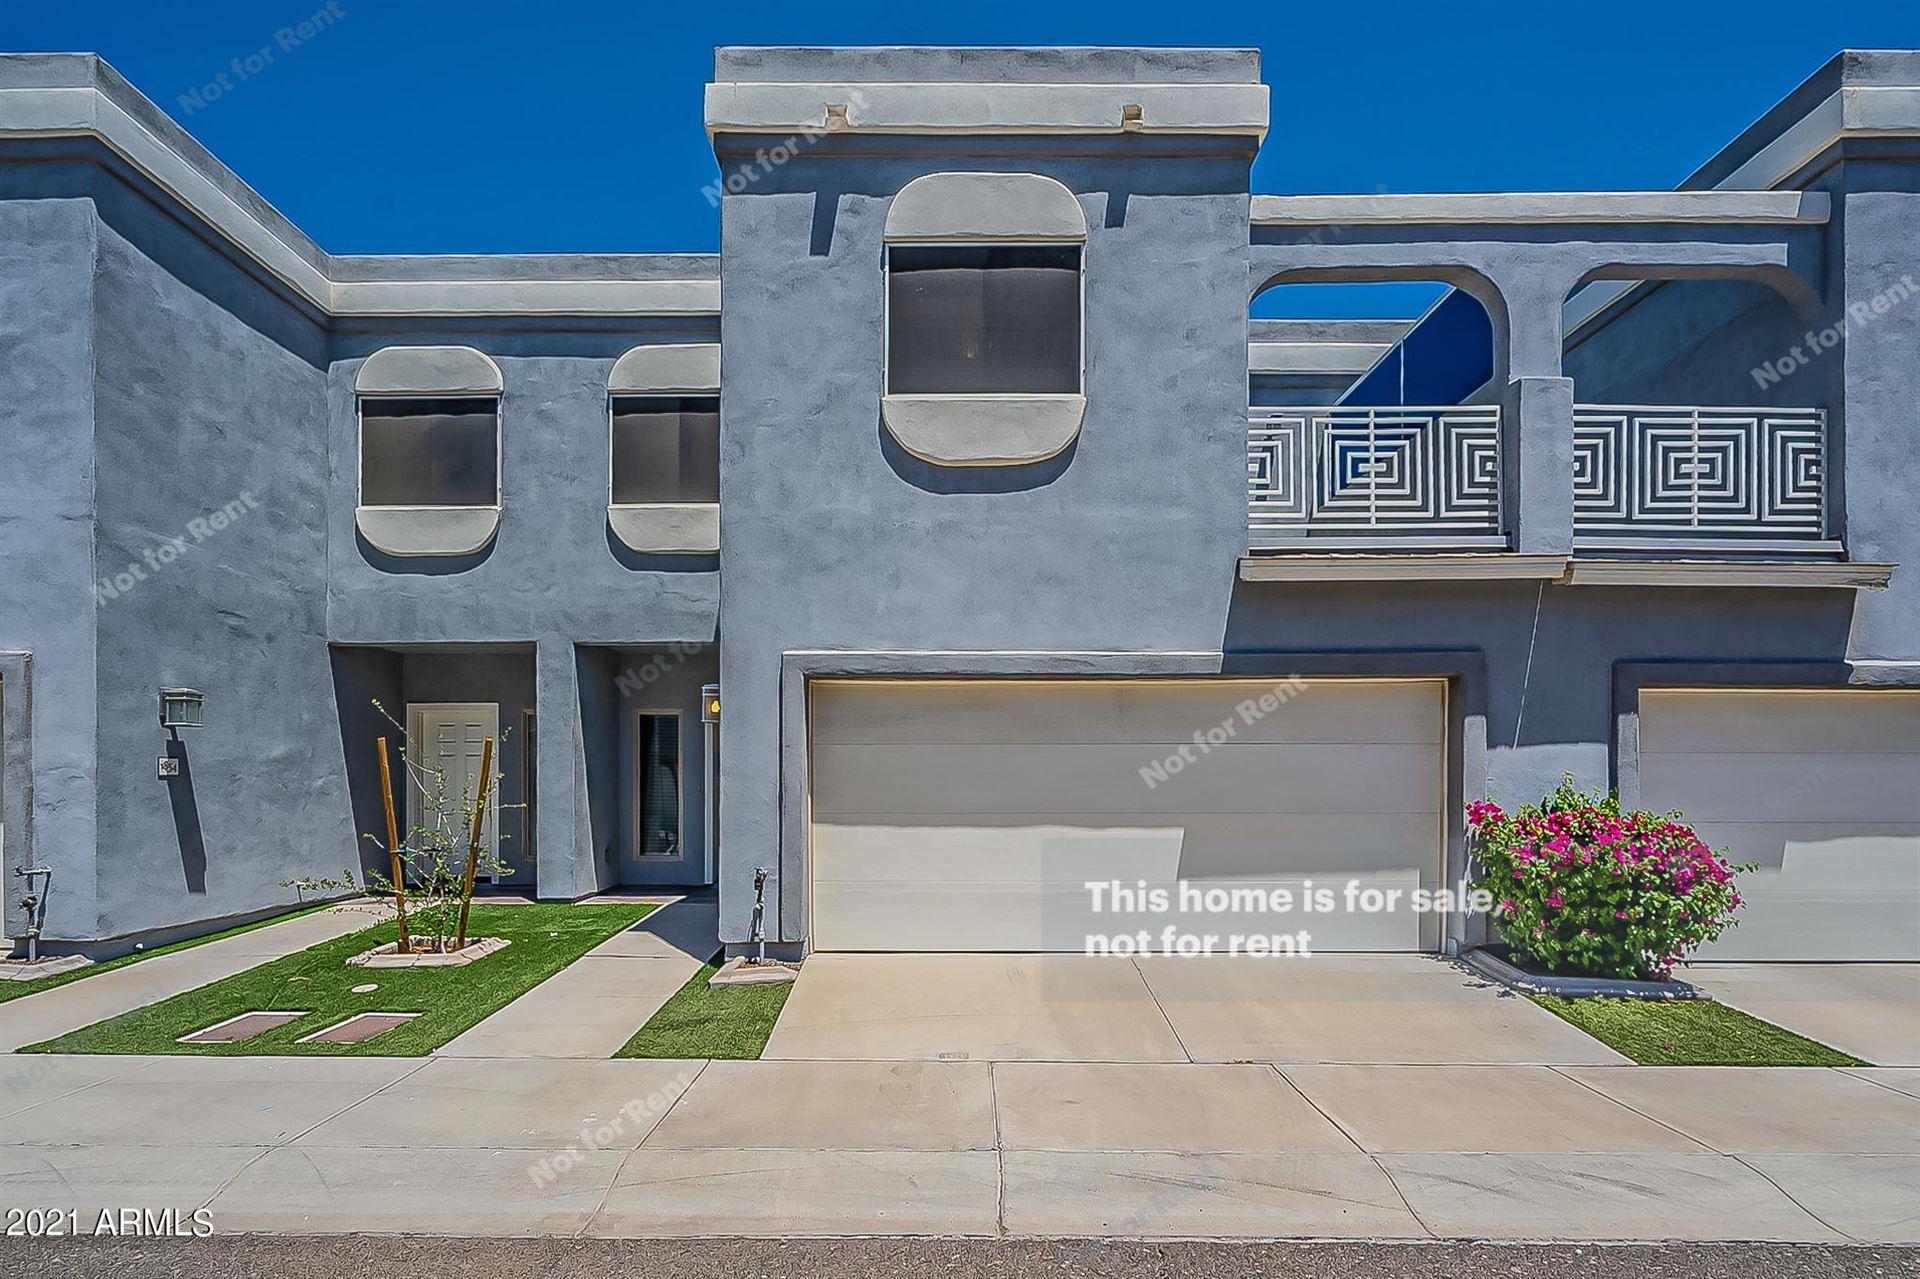 1850 W VERMONT Avenue, Phoenix, AZ 85015 - MLS#: 6239058